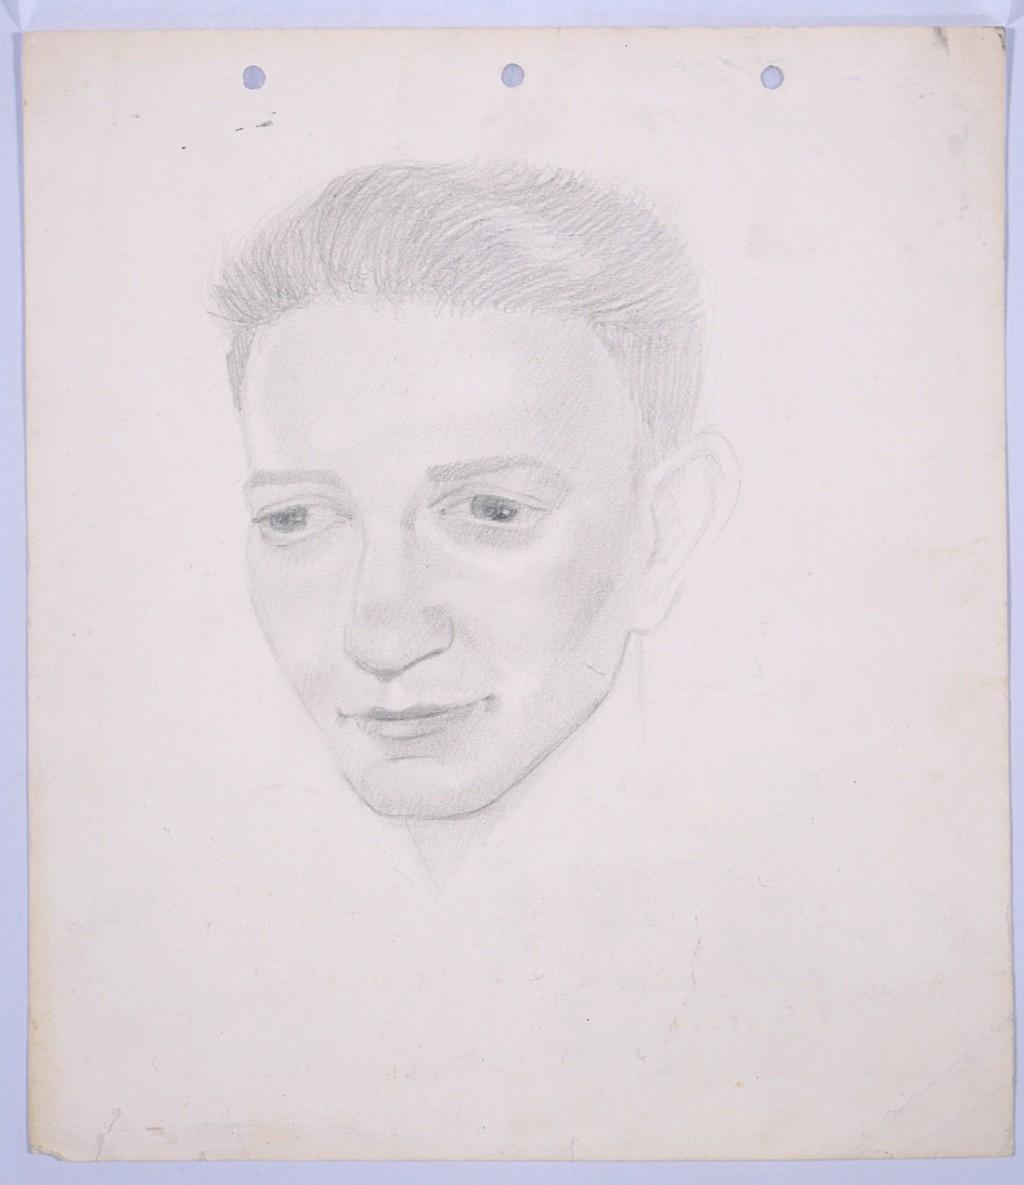 Portrait by refugee artist Yonia Fain [LCID: 2002a57z]